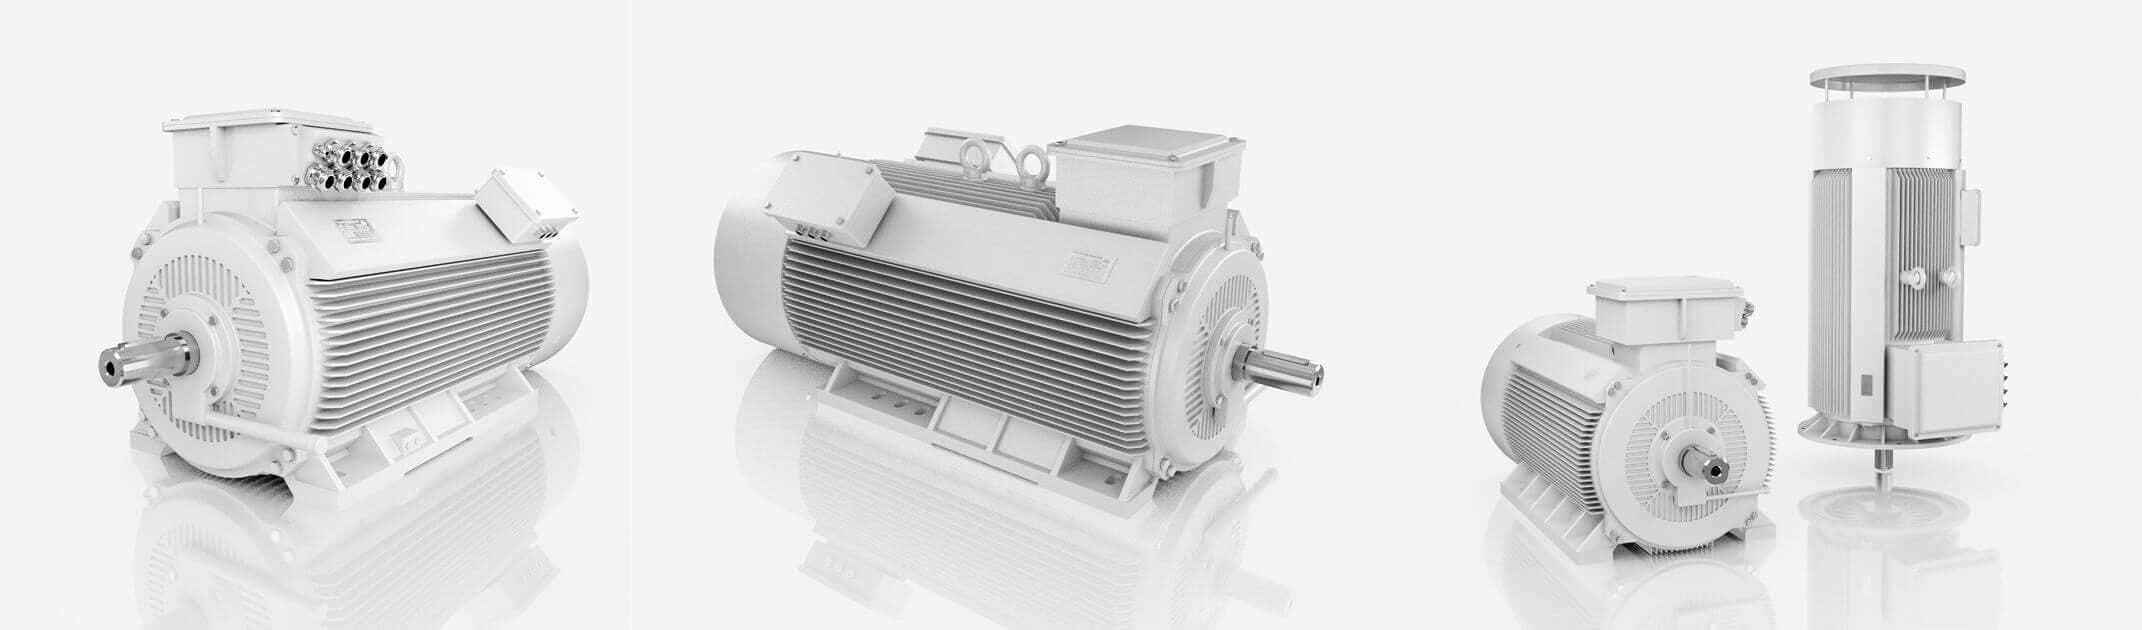 kompaktné motory VYBO Electric